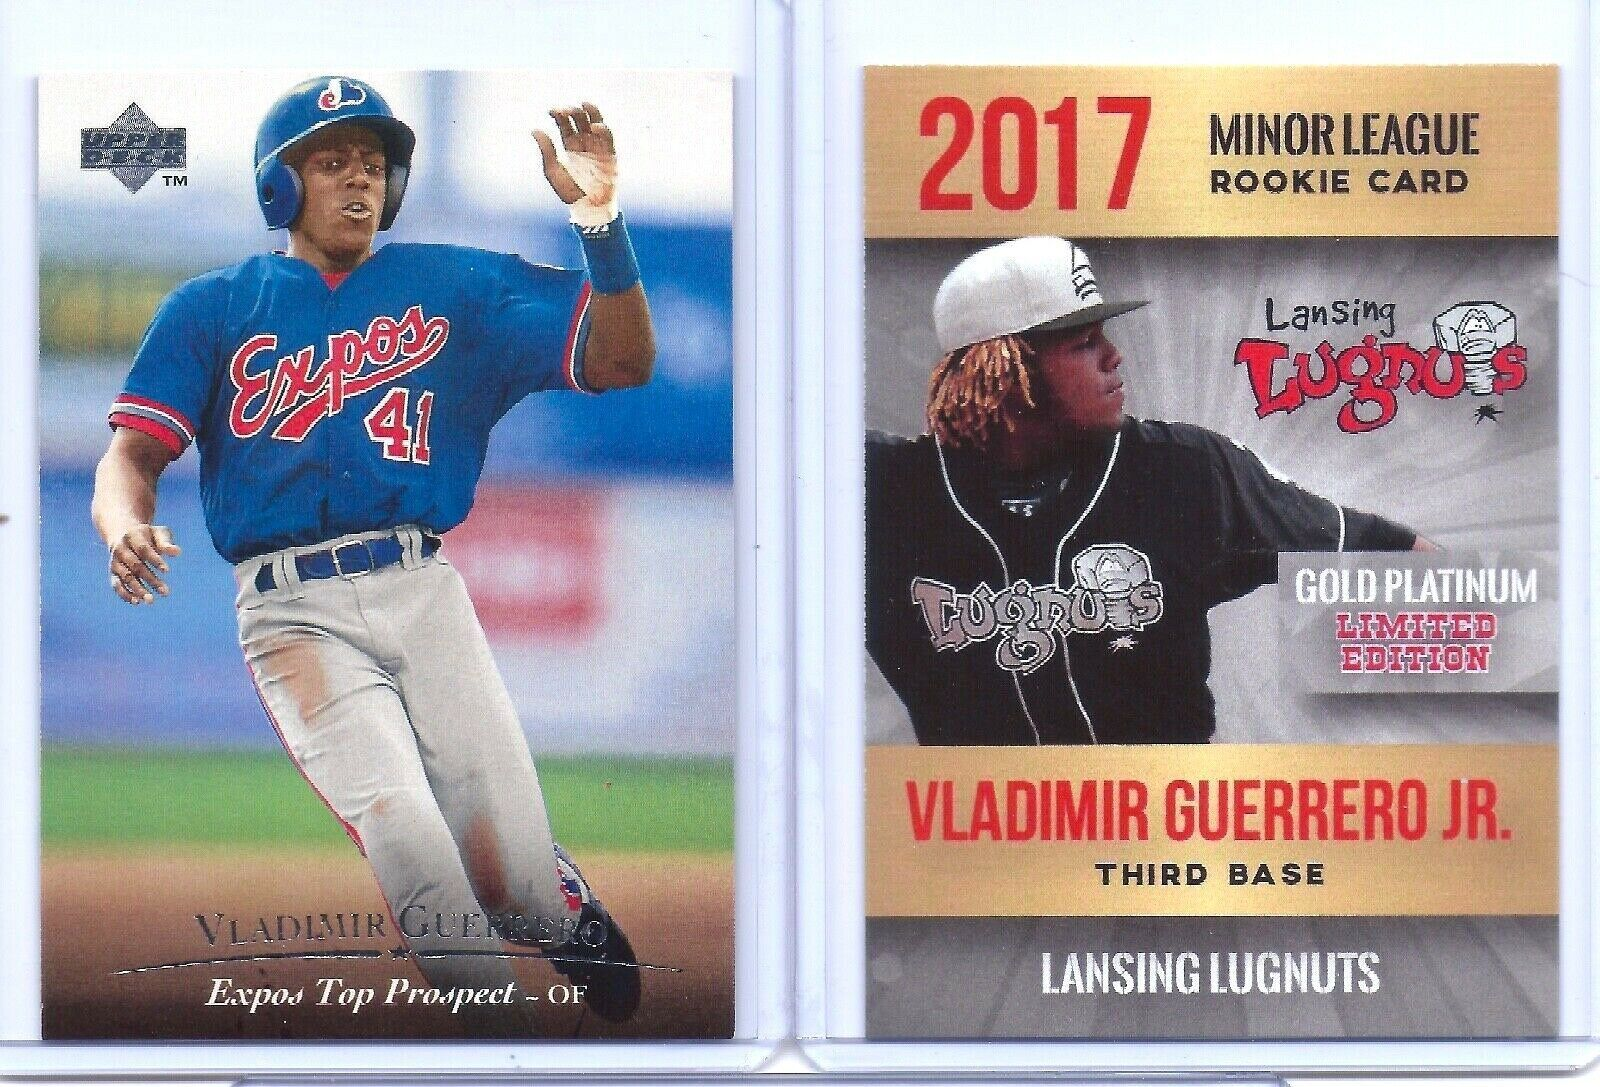 VLADIMIR GUERRERO JR. & VLADIMIR GUERRERO SR. 2004/2017 ROOKIE CARD LOT! HOF!